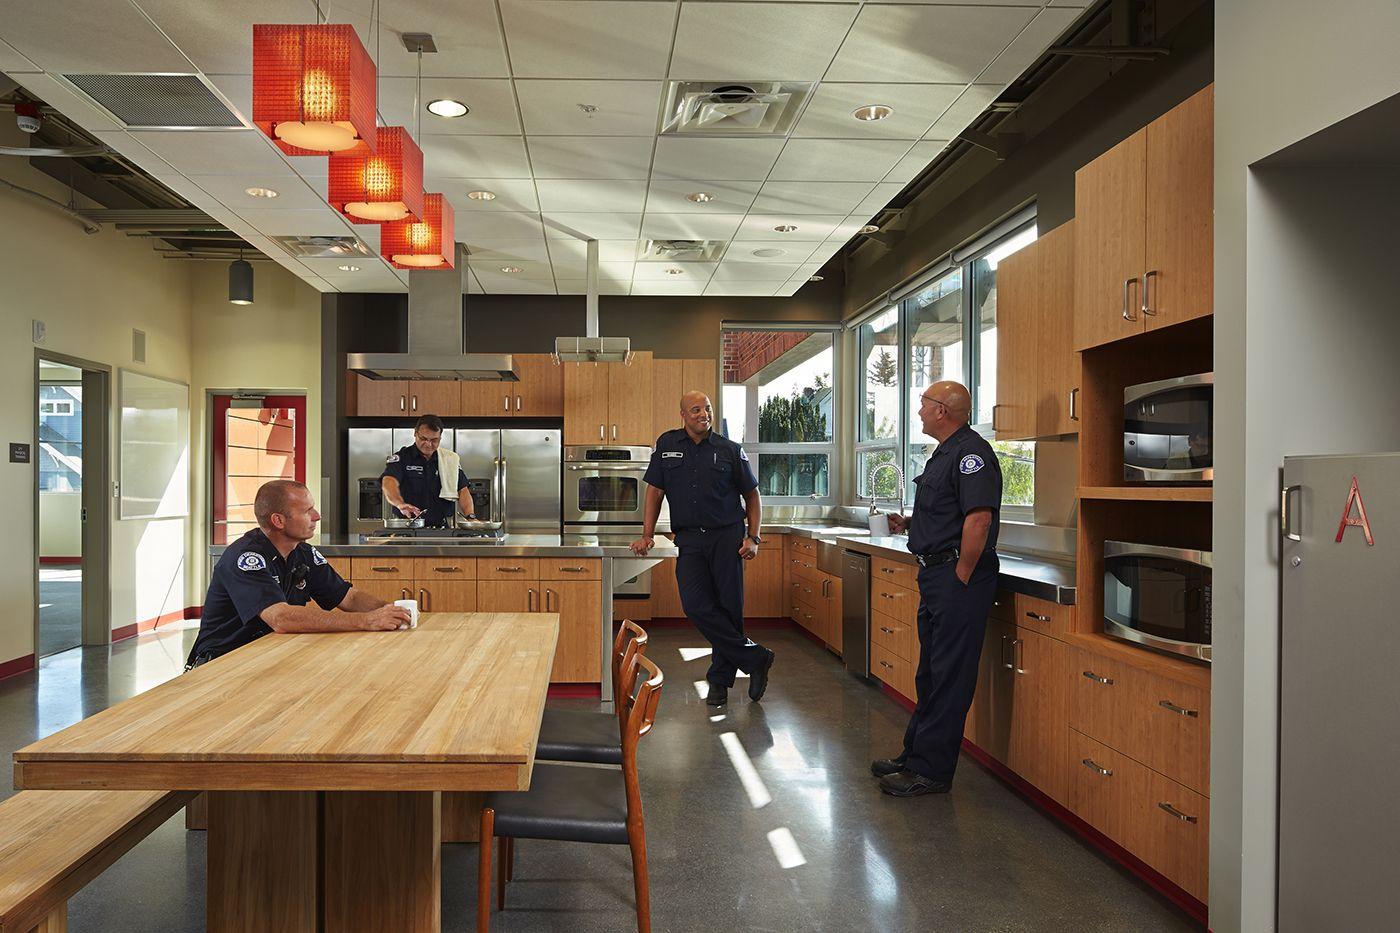 Explore Fire Department Interior Design And More